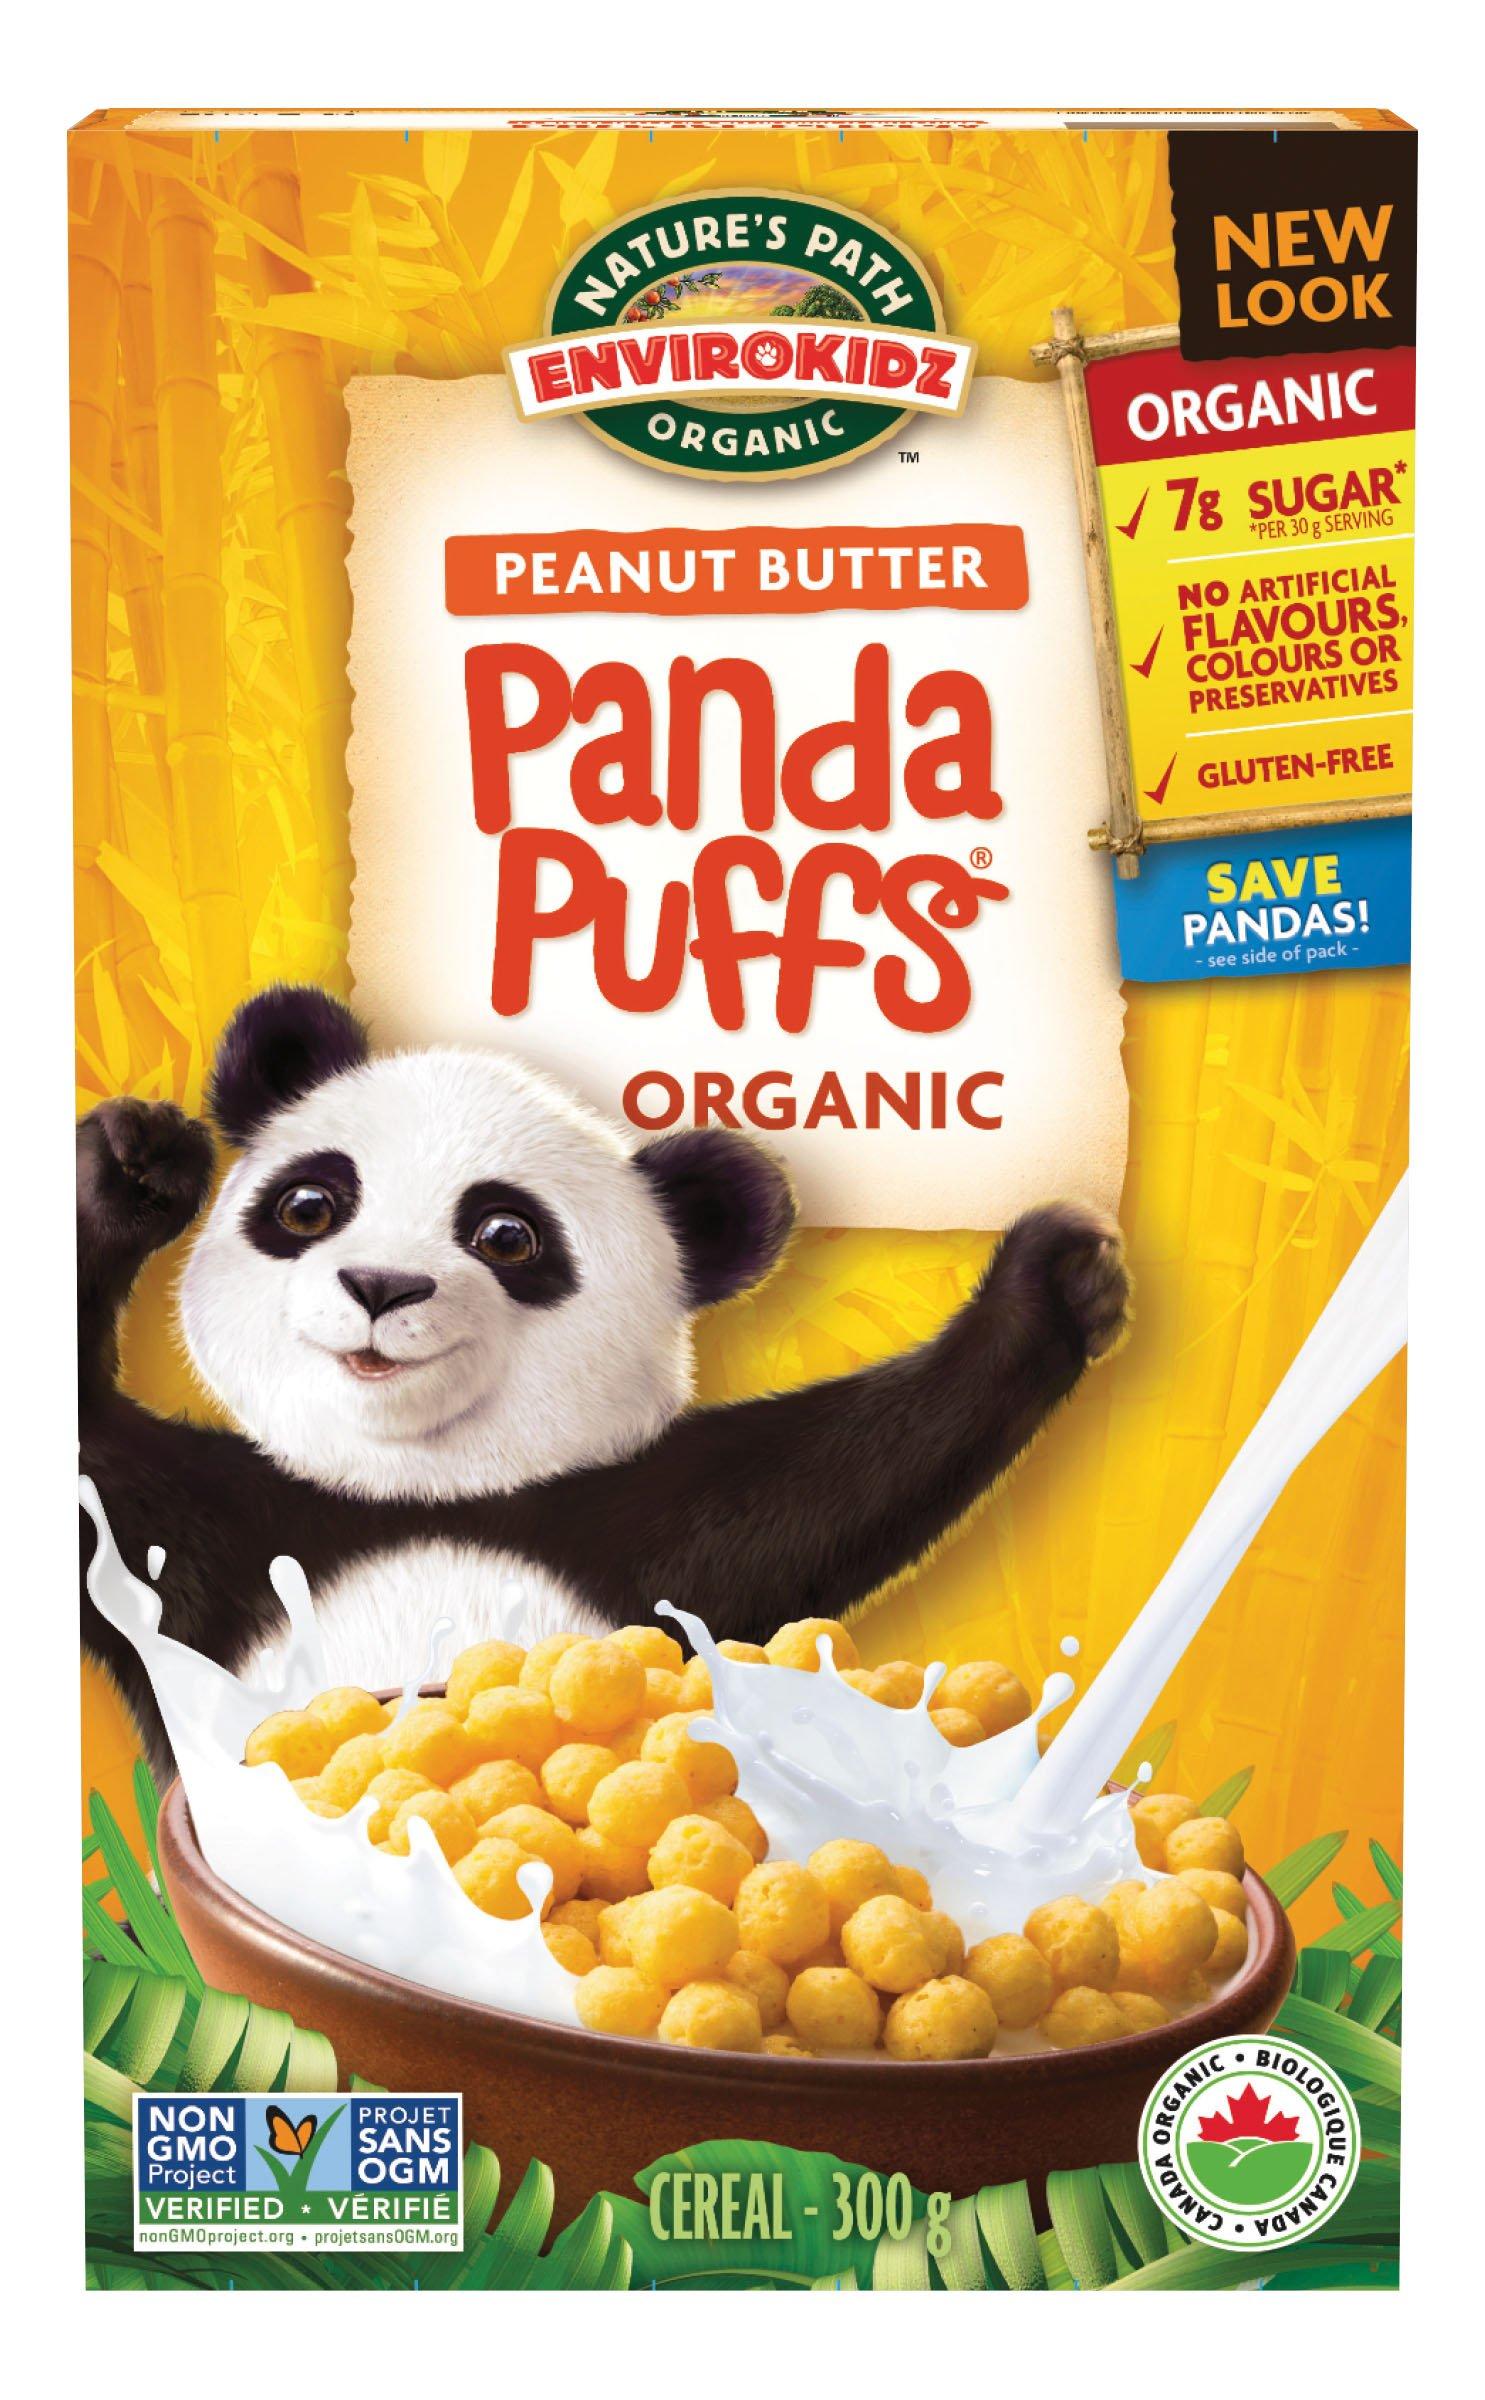 EnviroKidz Peanut Butter Panda Puffs Frees Cereal, 10.6 oz